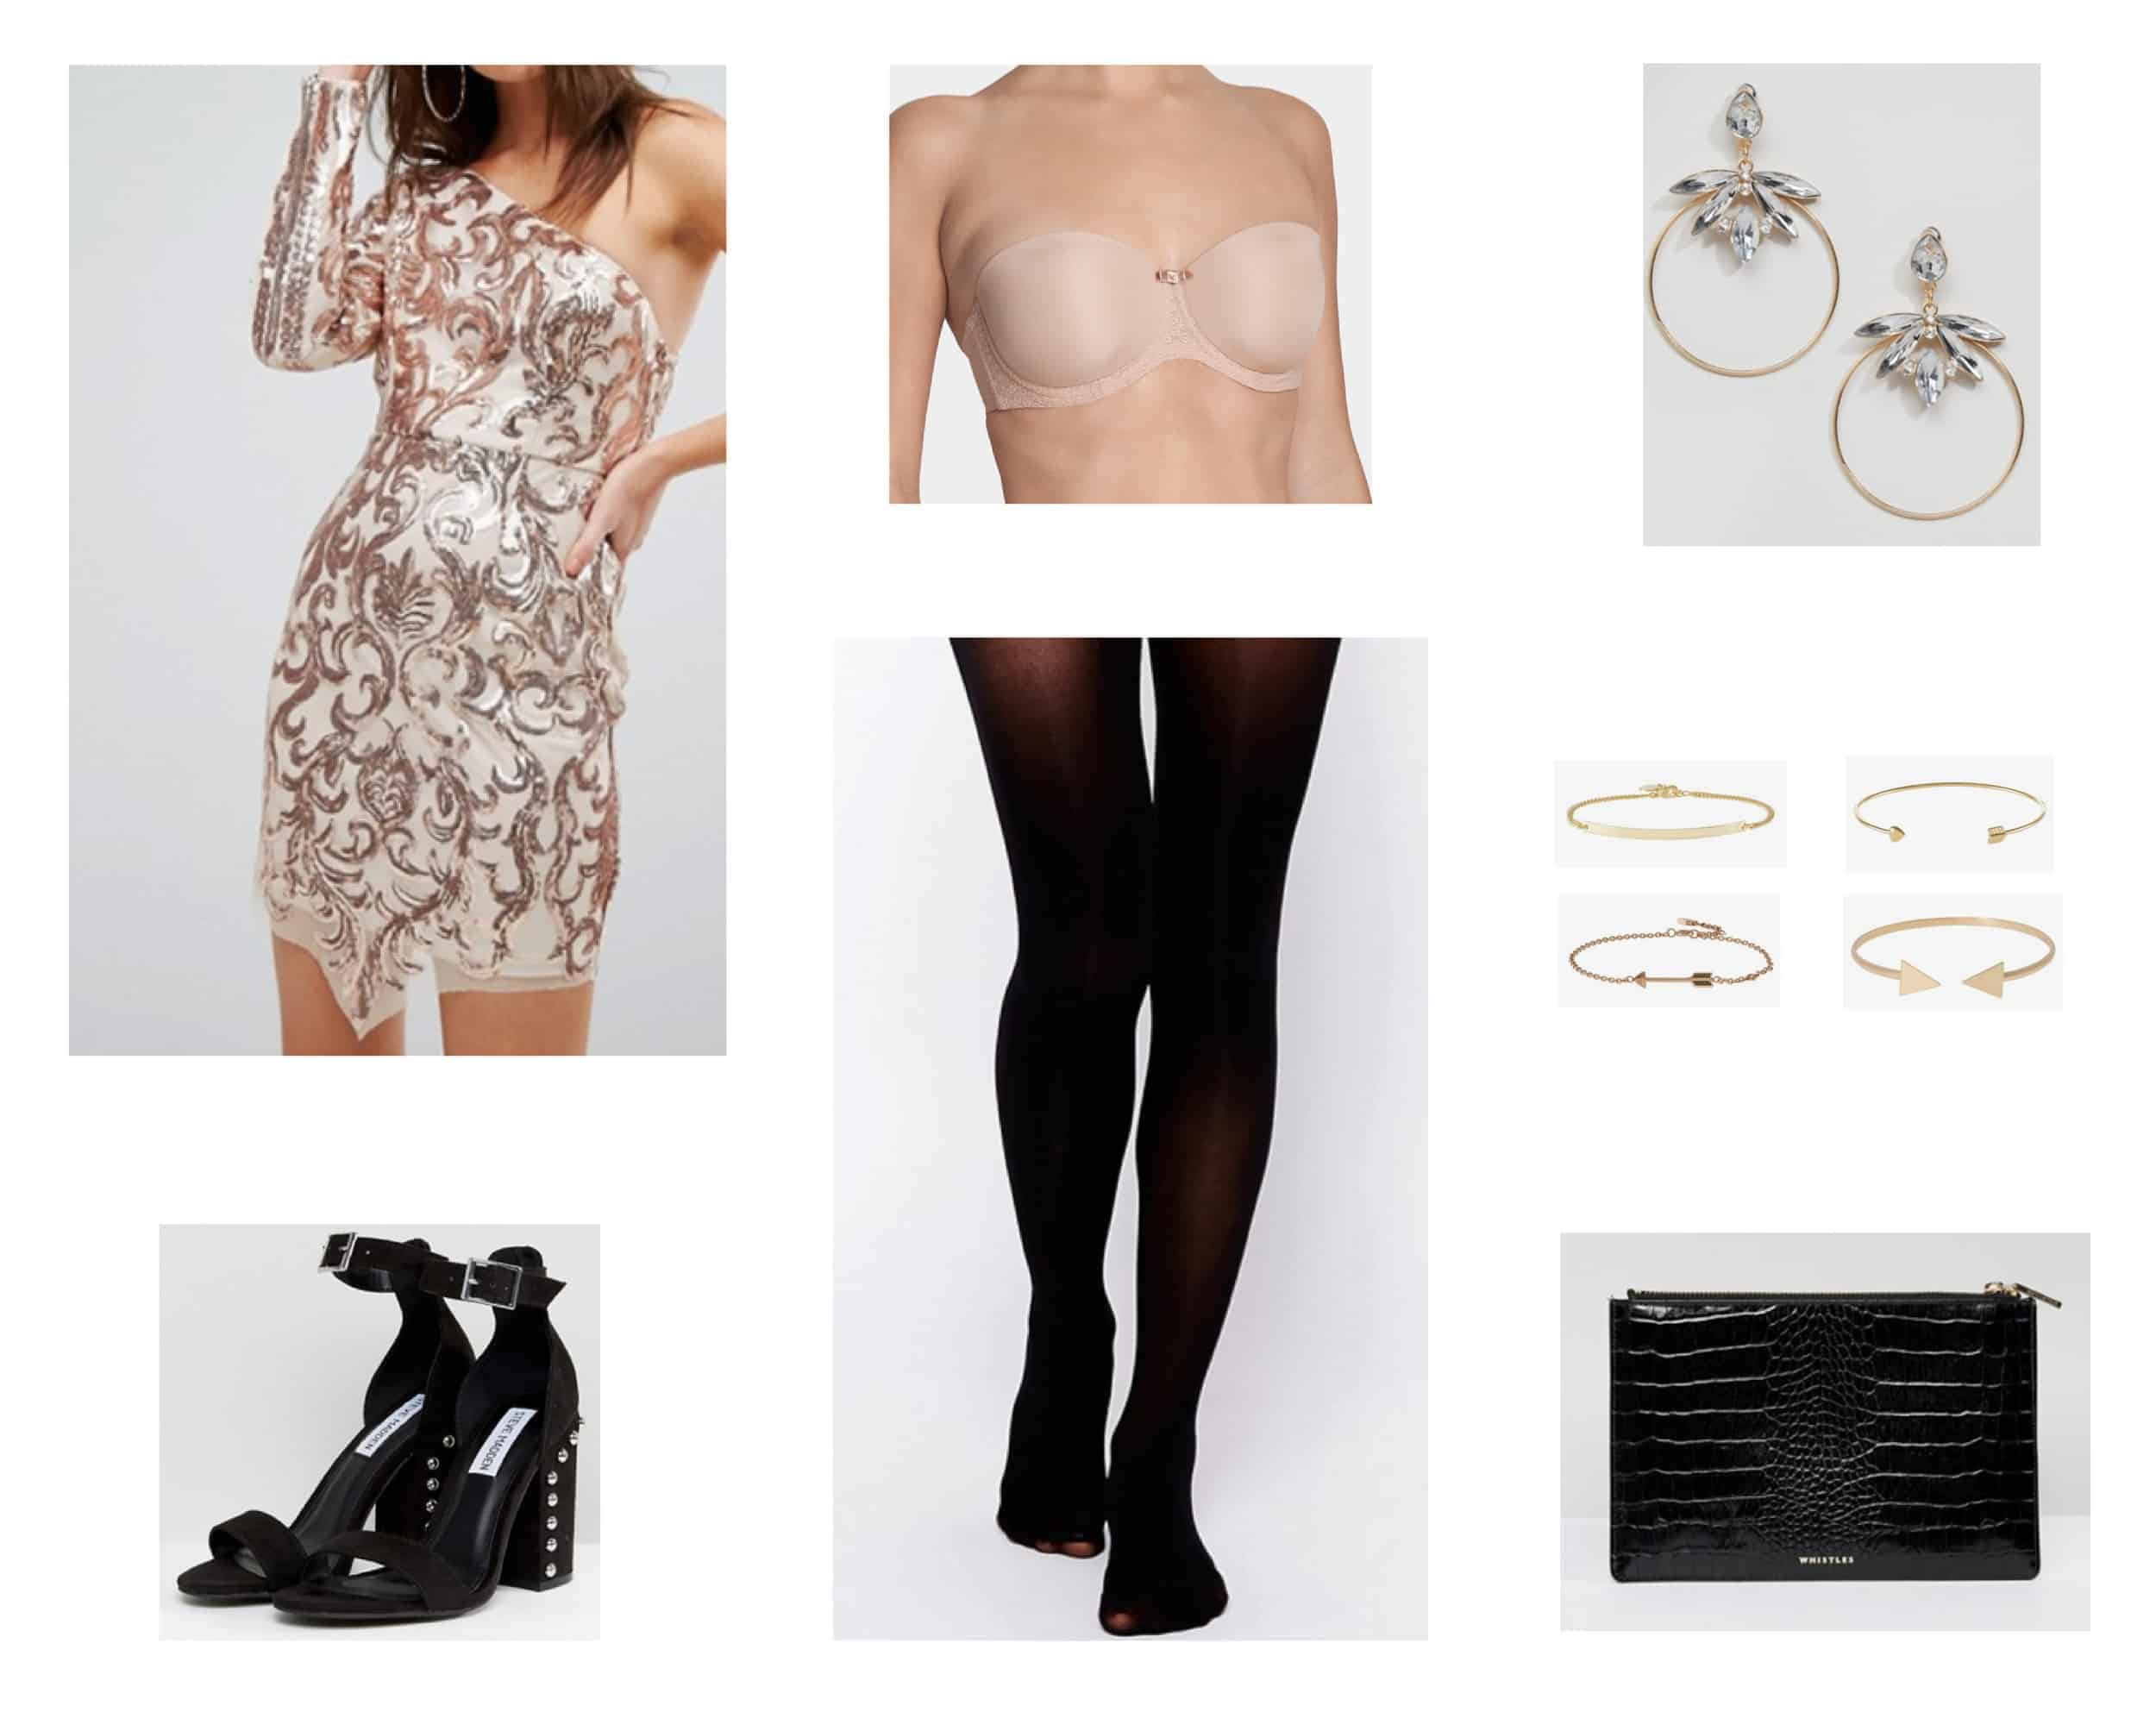 boite de nuit tenue fashion designs. Black Bedroom Furniture Sets. Home Design Ideas